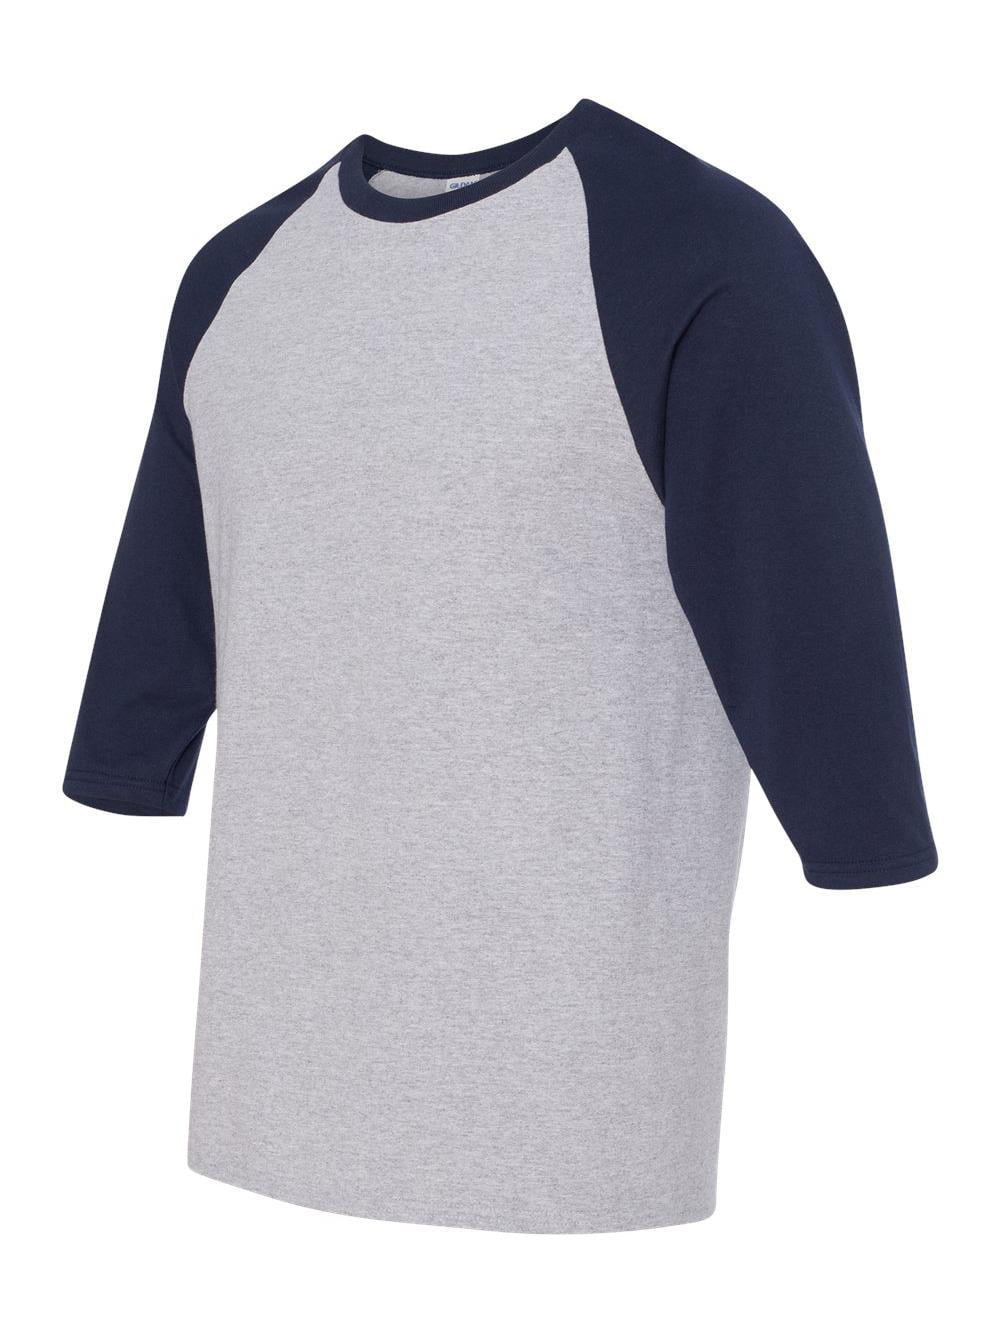 Australian Merino Wool Kids Long Sleeve T-Shirt - Woolerina